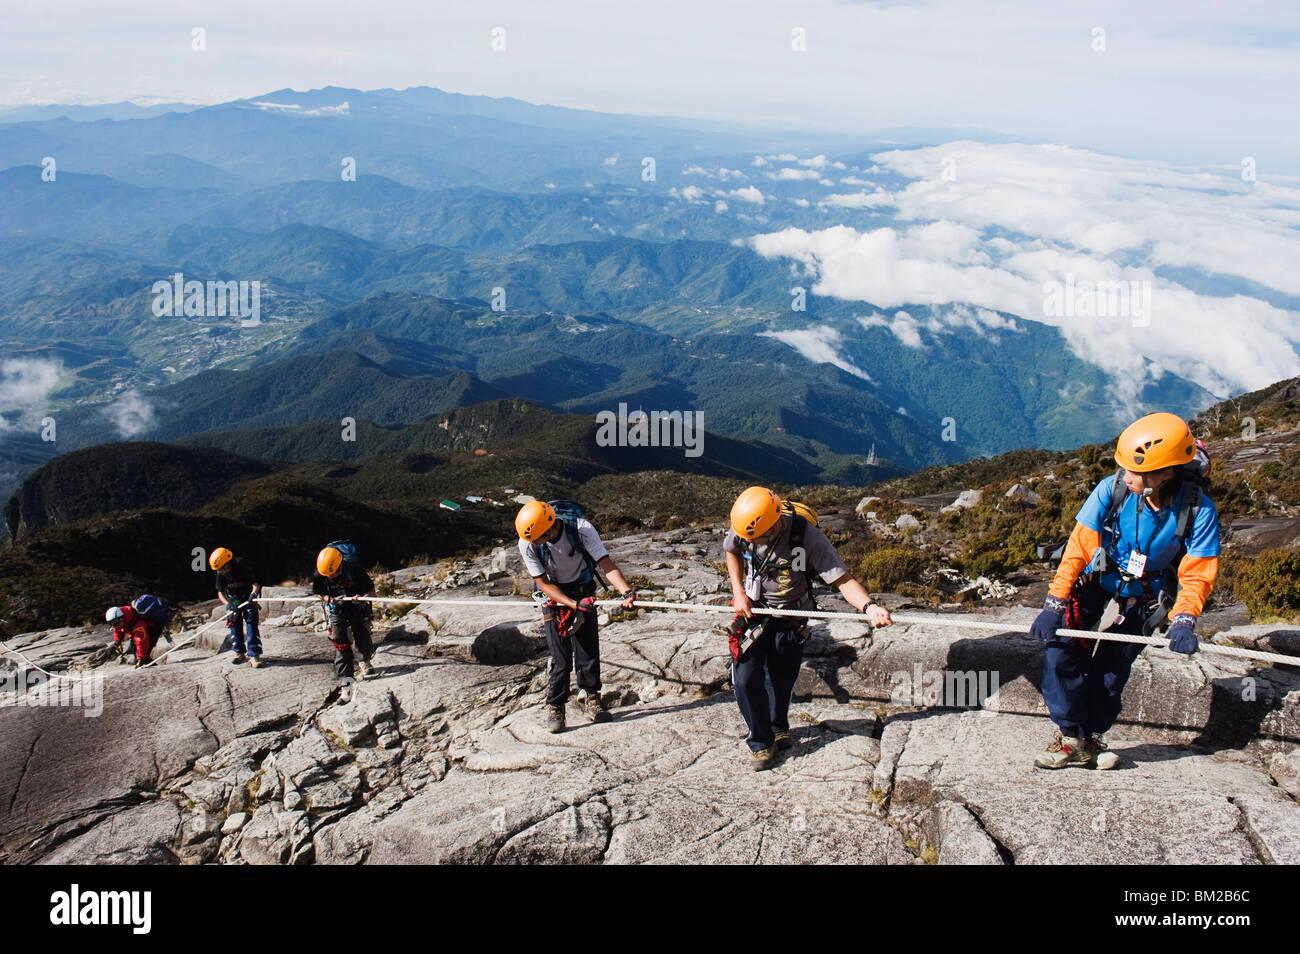 Via ferrata, Kinabalu National Park, Malaysia's highest mountain 4095m, Sabah, Borneo, Malaysia, Southeast Asia - Stock Image